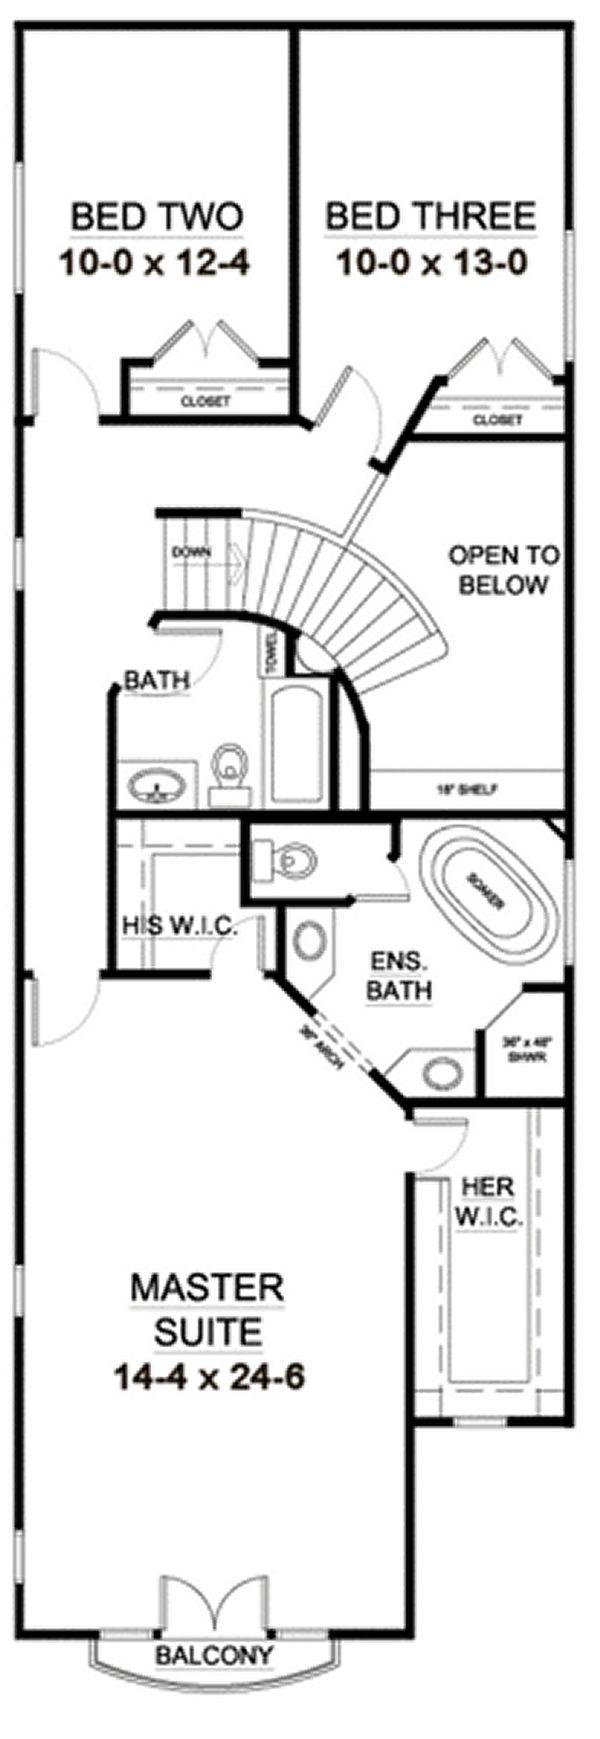 Dream House Plan - European Floor Plan - Upper Floor Plan #126-227